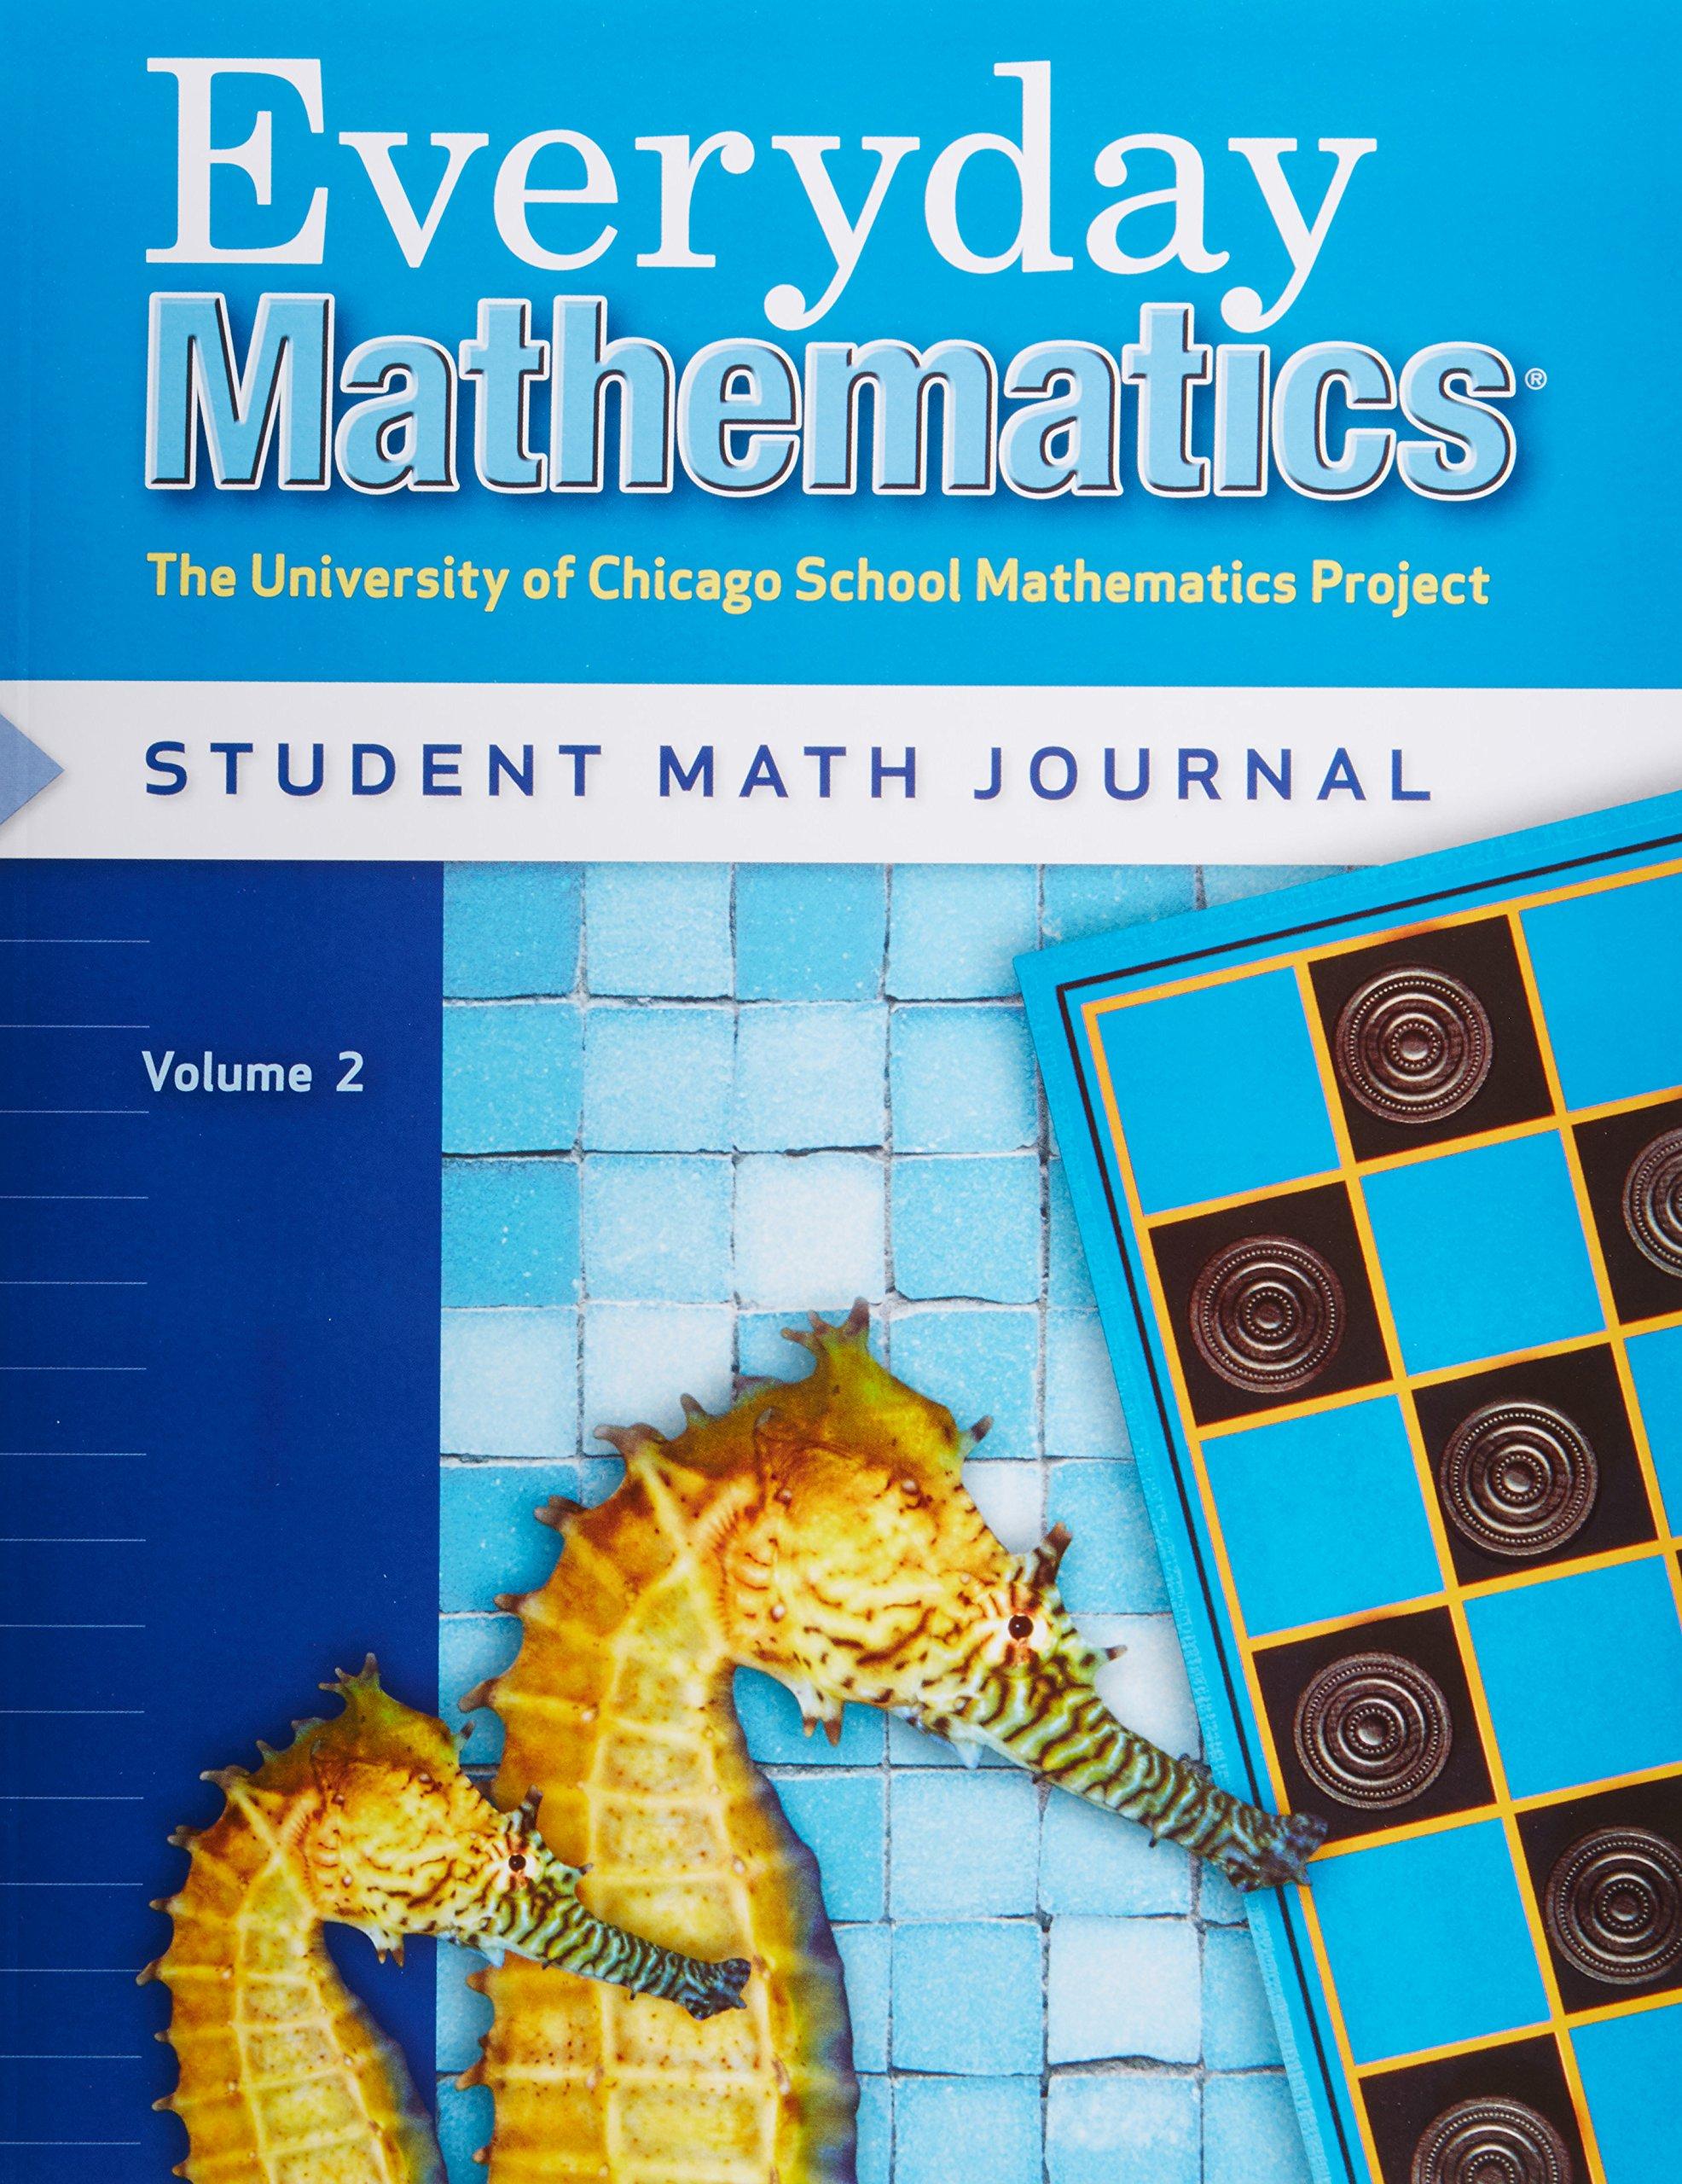 Everyday Mathematics Student Math Journal Volume 1 and 2 - Reorder ...